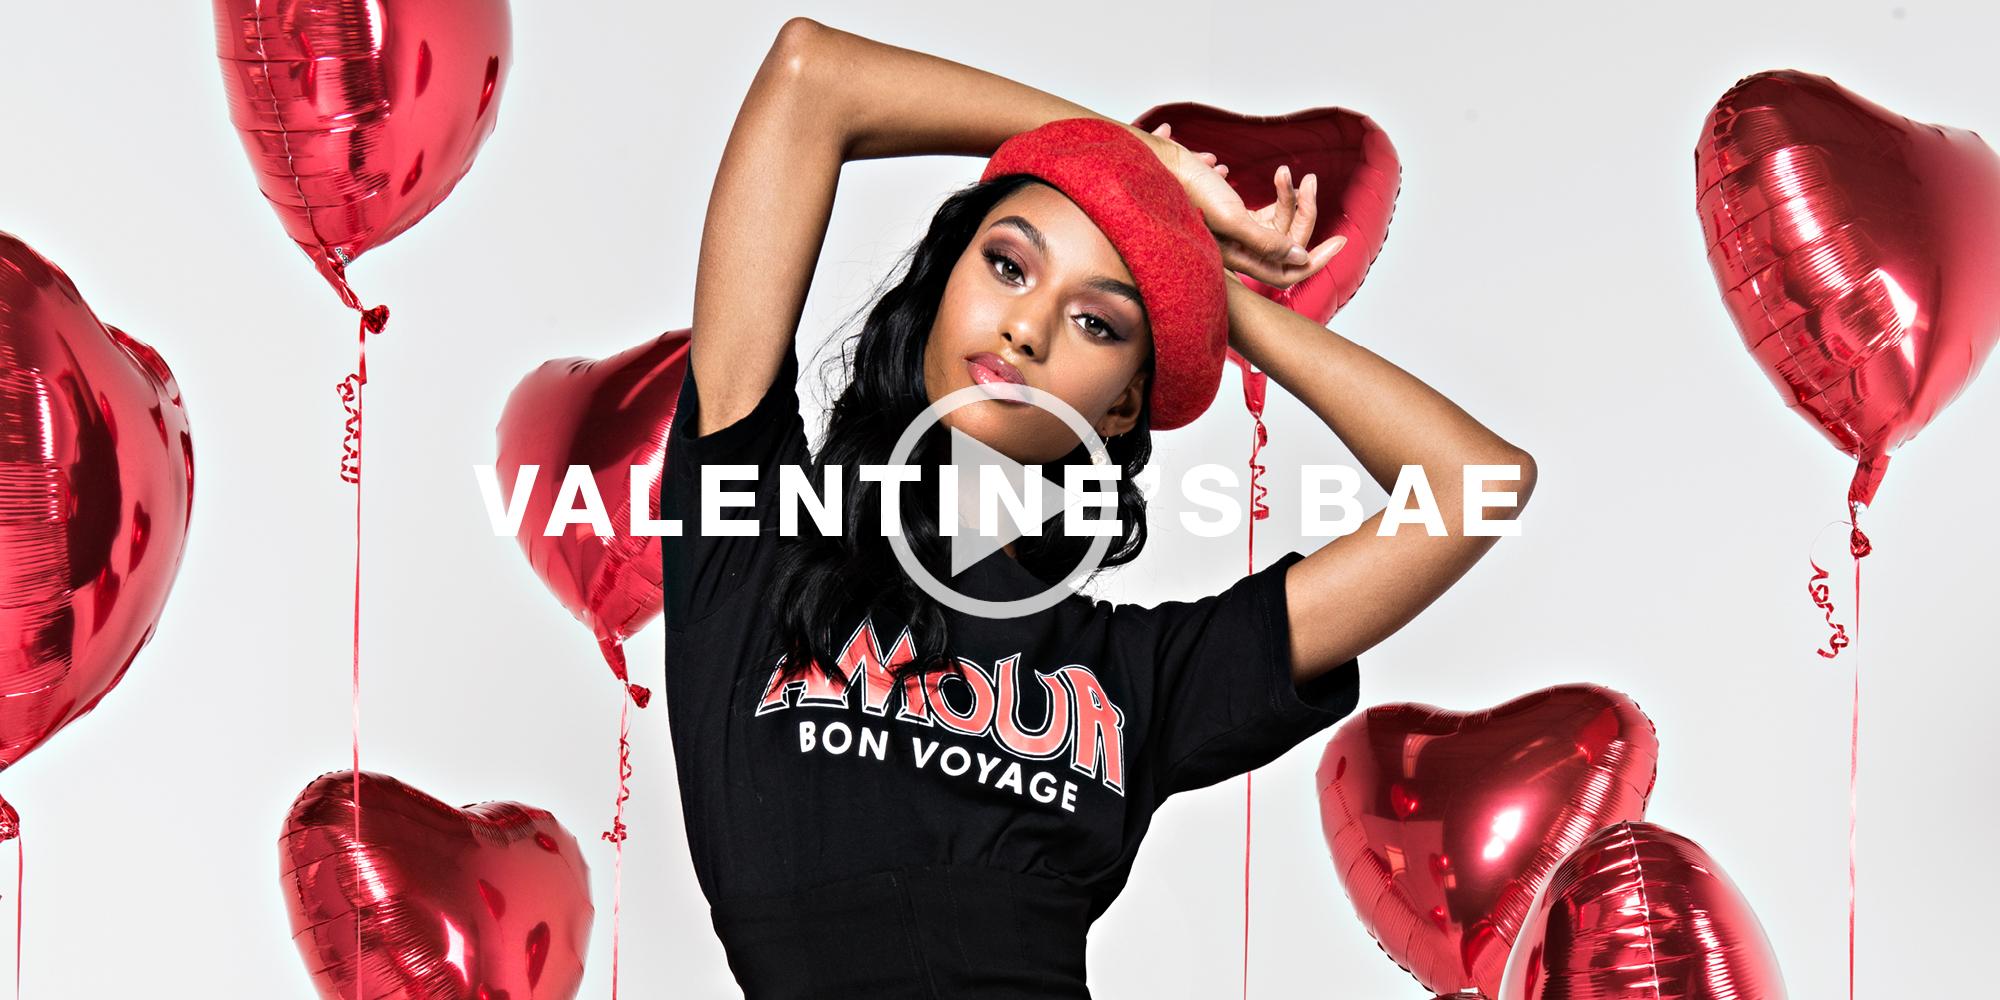 Valentine's Bae